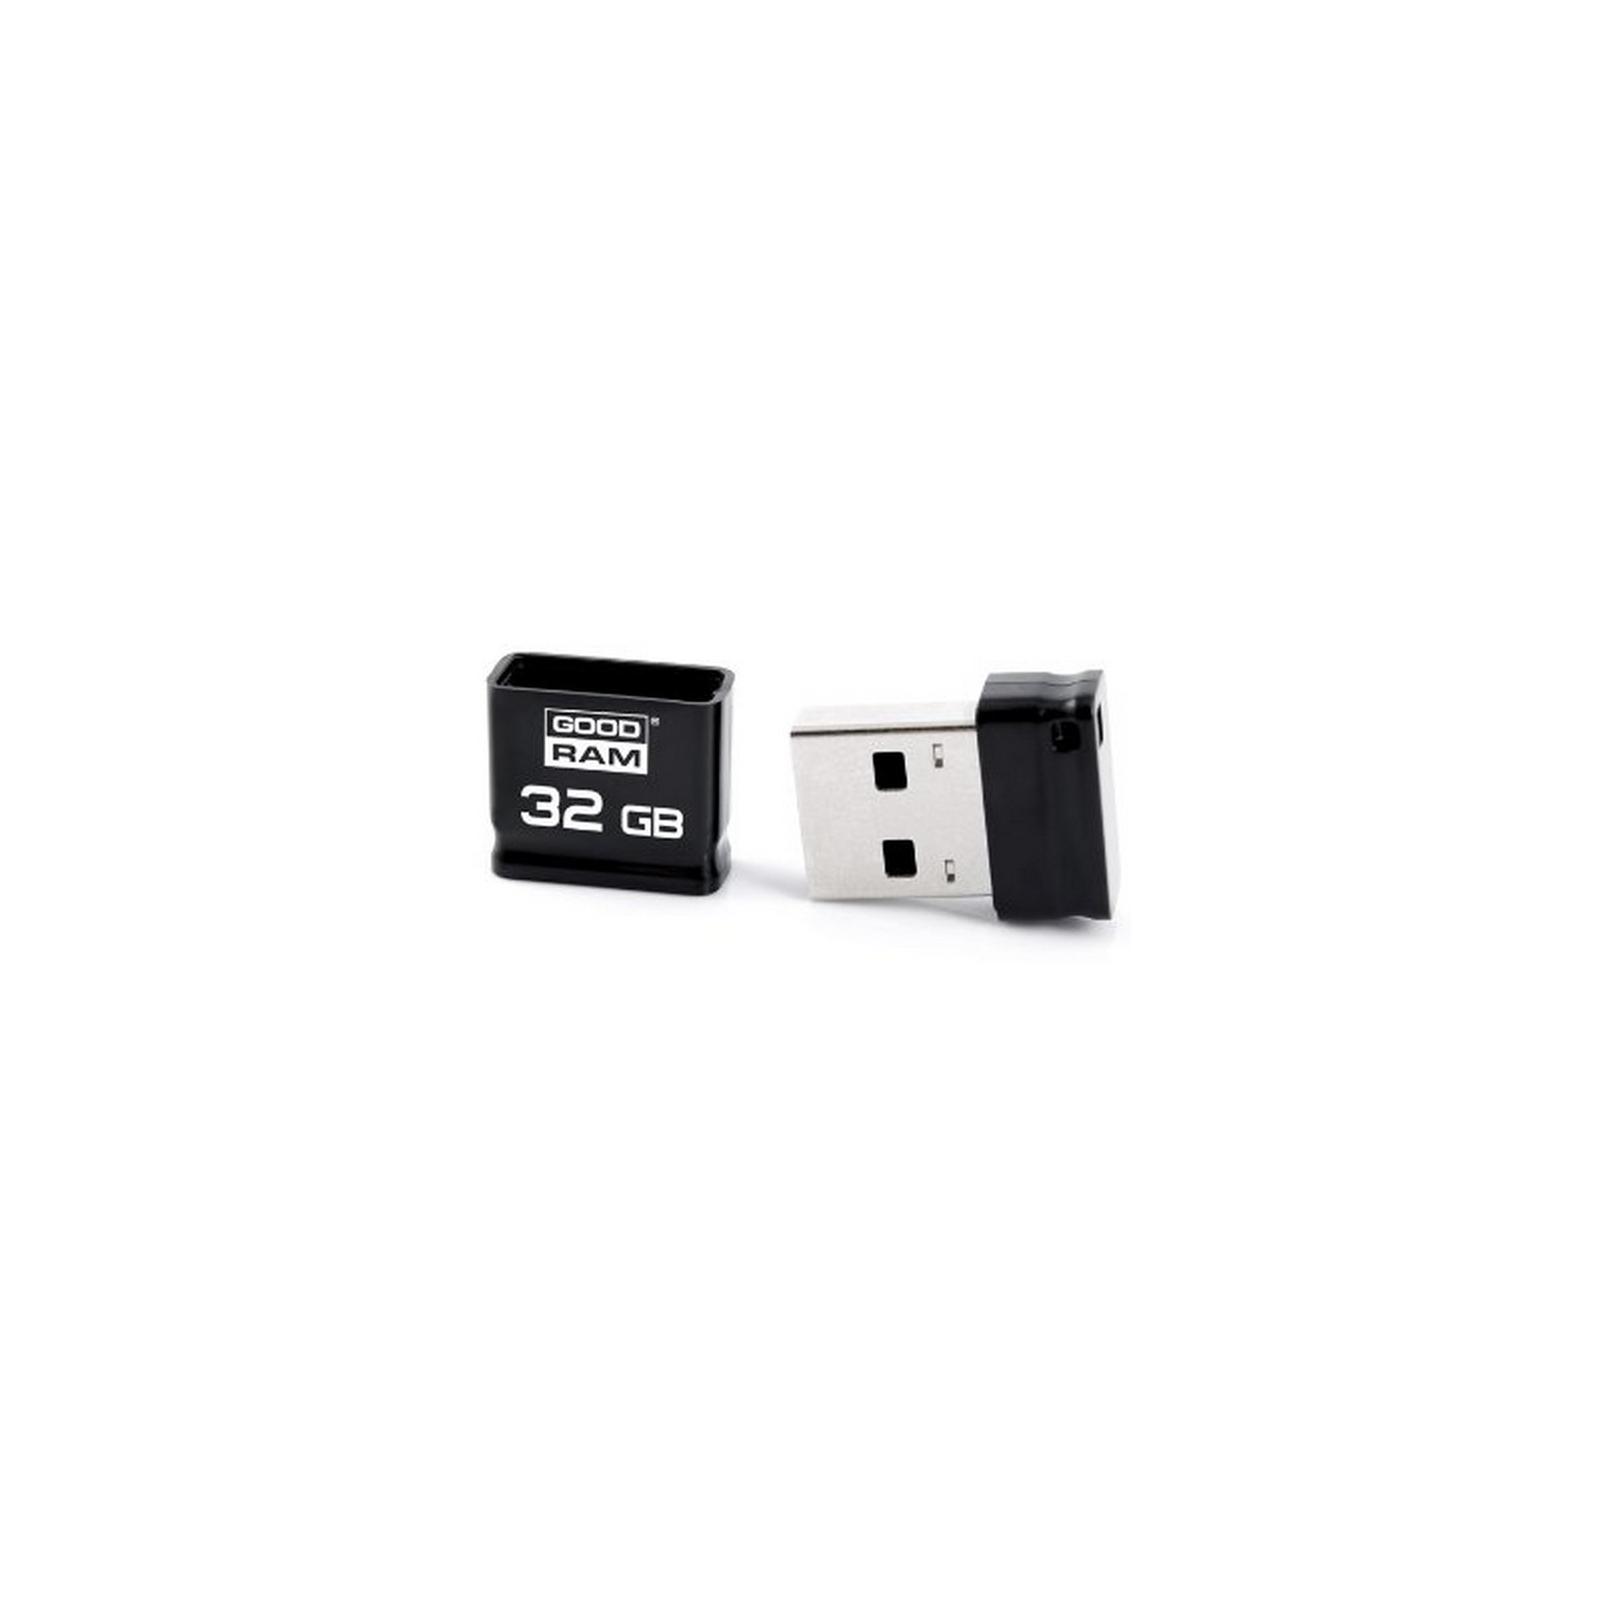 USB флеш накопитель Goodram 32GB Piccolo Black USB 2.0 (UPI2-0320K0R11) изображение 2